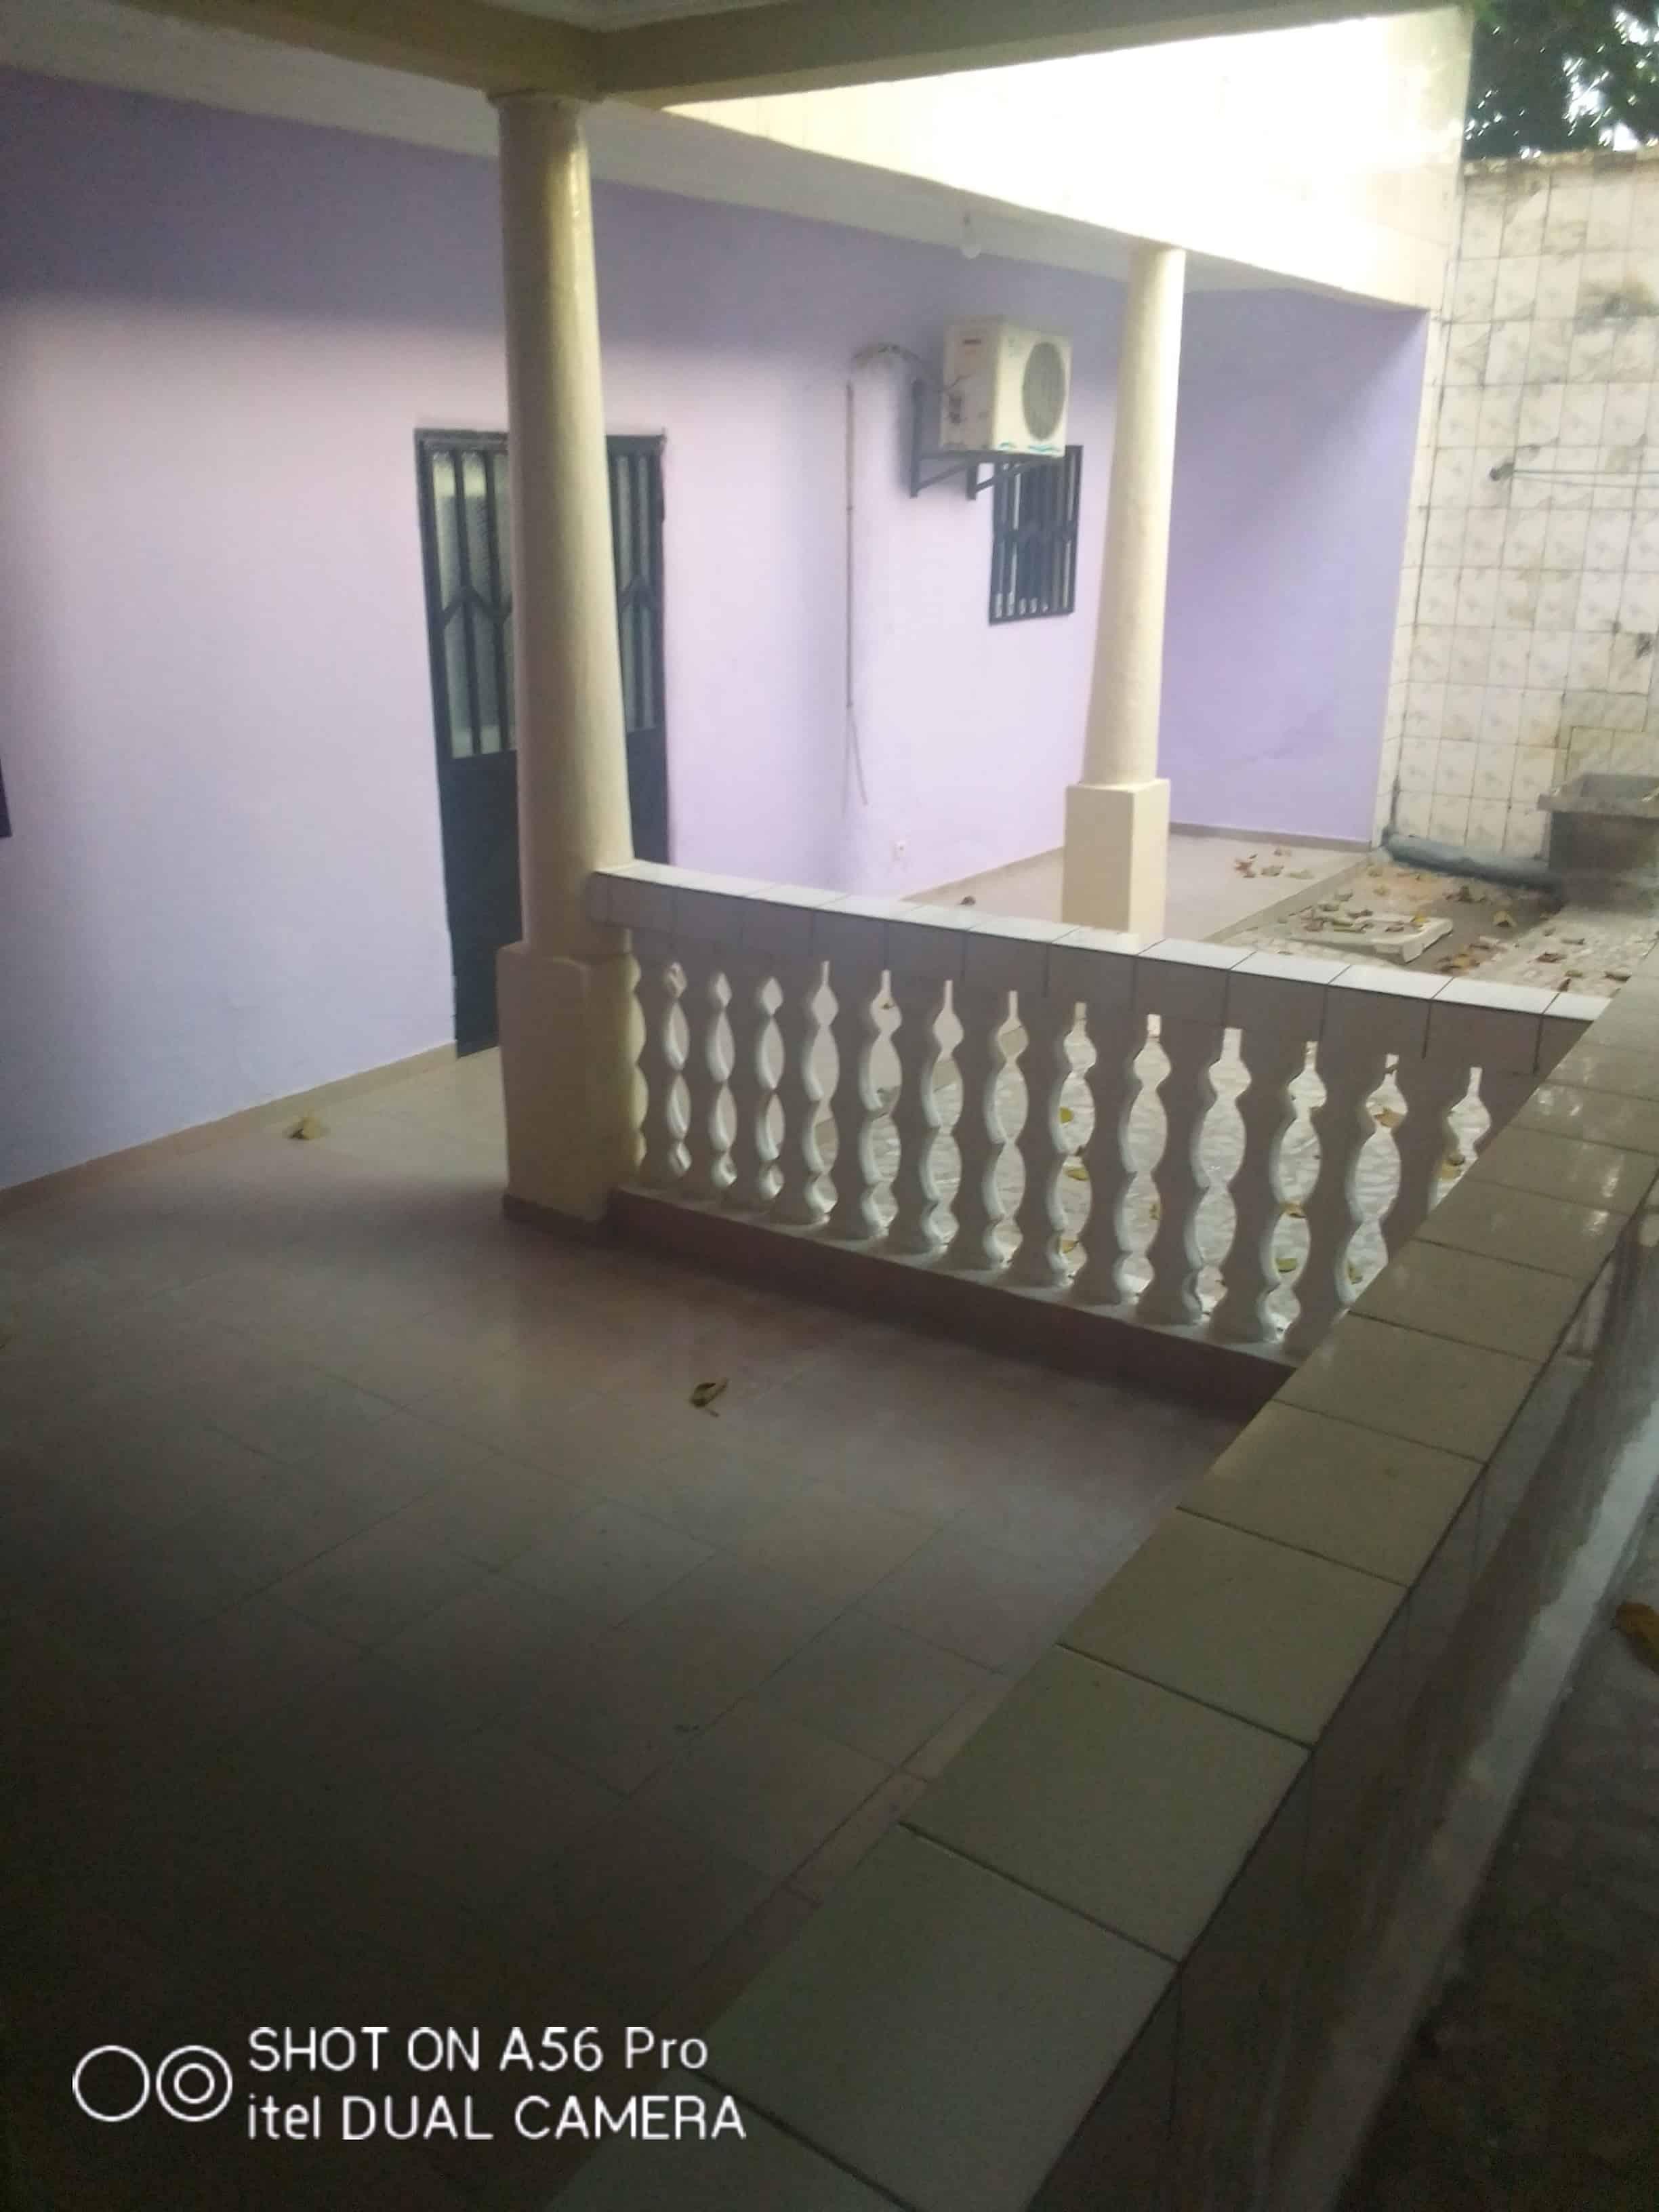 House (Villa) to rent - Douala, Logpom, Basson - 1 living room(s), 3 bedroom(s), 2 bathroom(s) - 150 000 FCFA / month